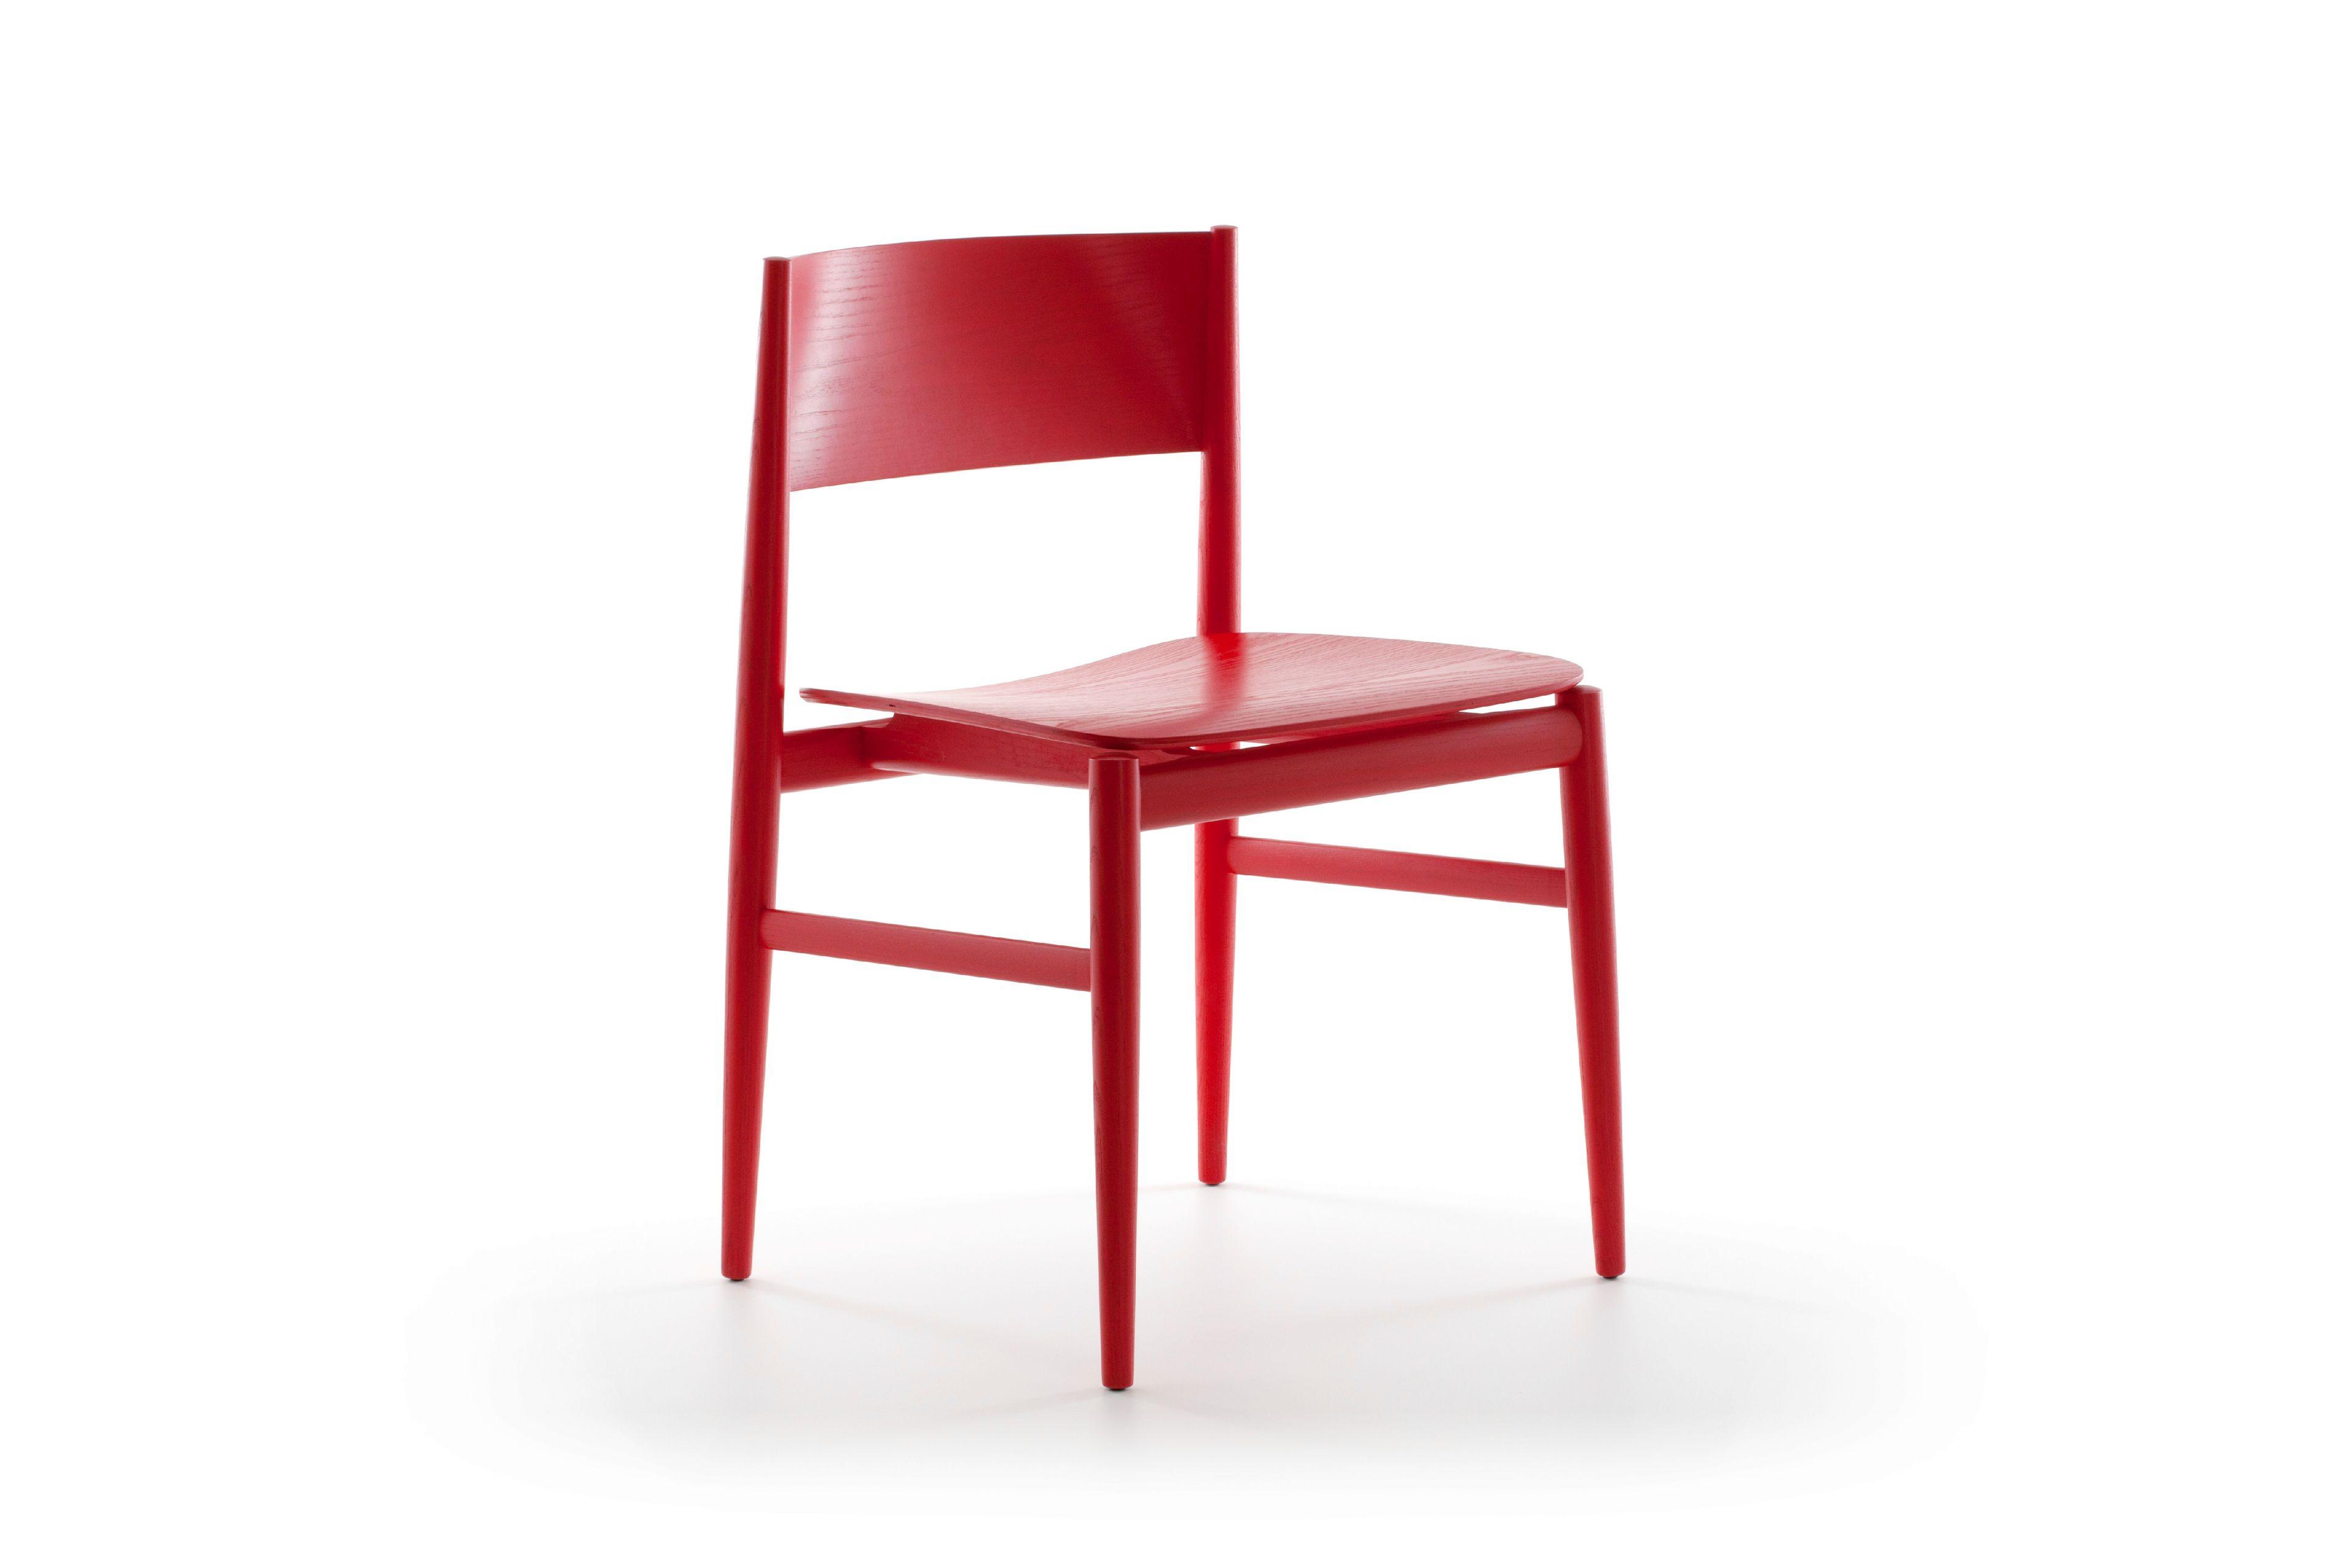 Design upholstered ash chair